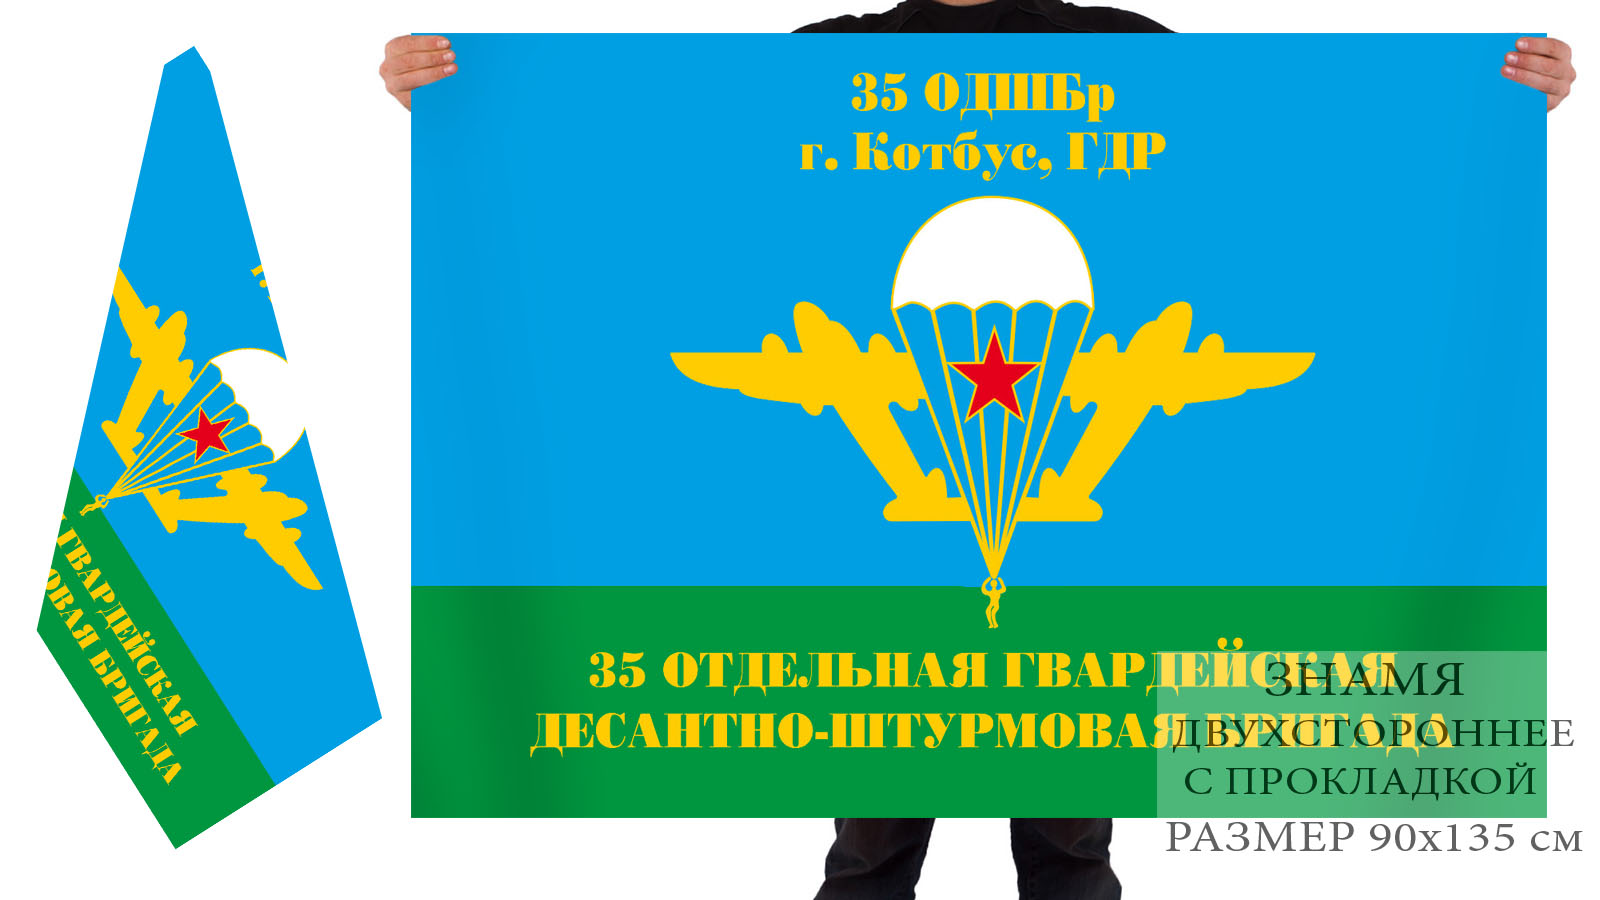 Двусторонний флаг 35 ОДШБр г. Котбус ГДР